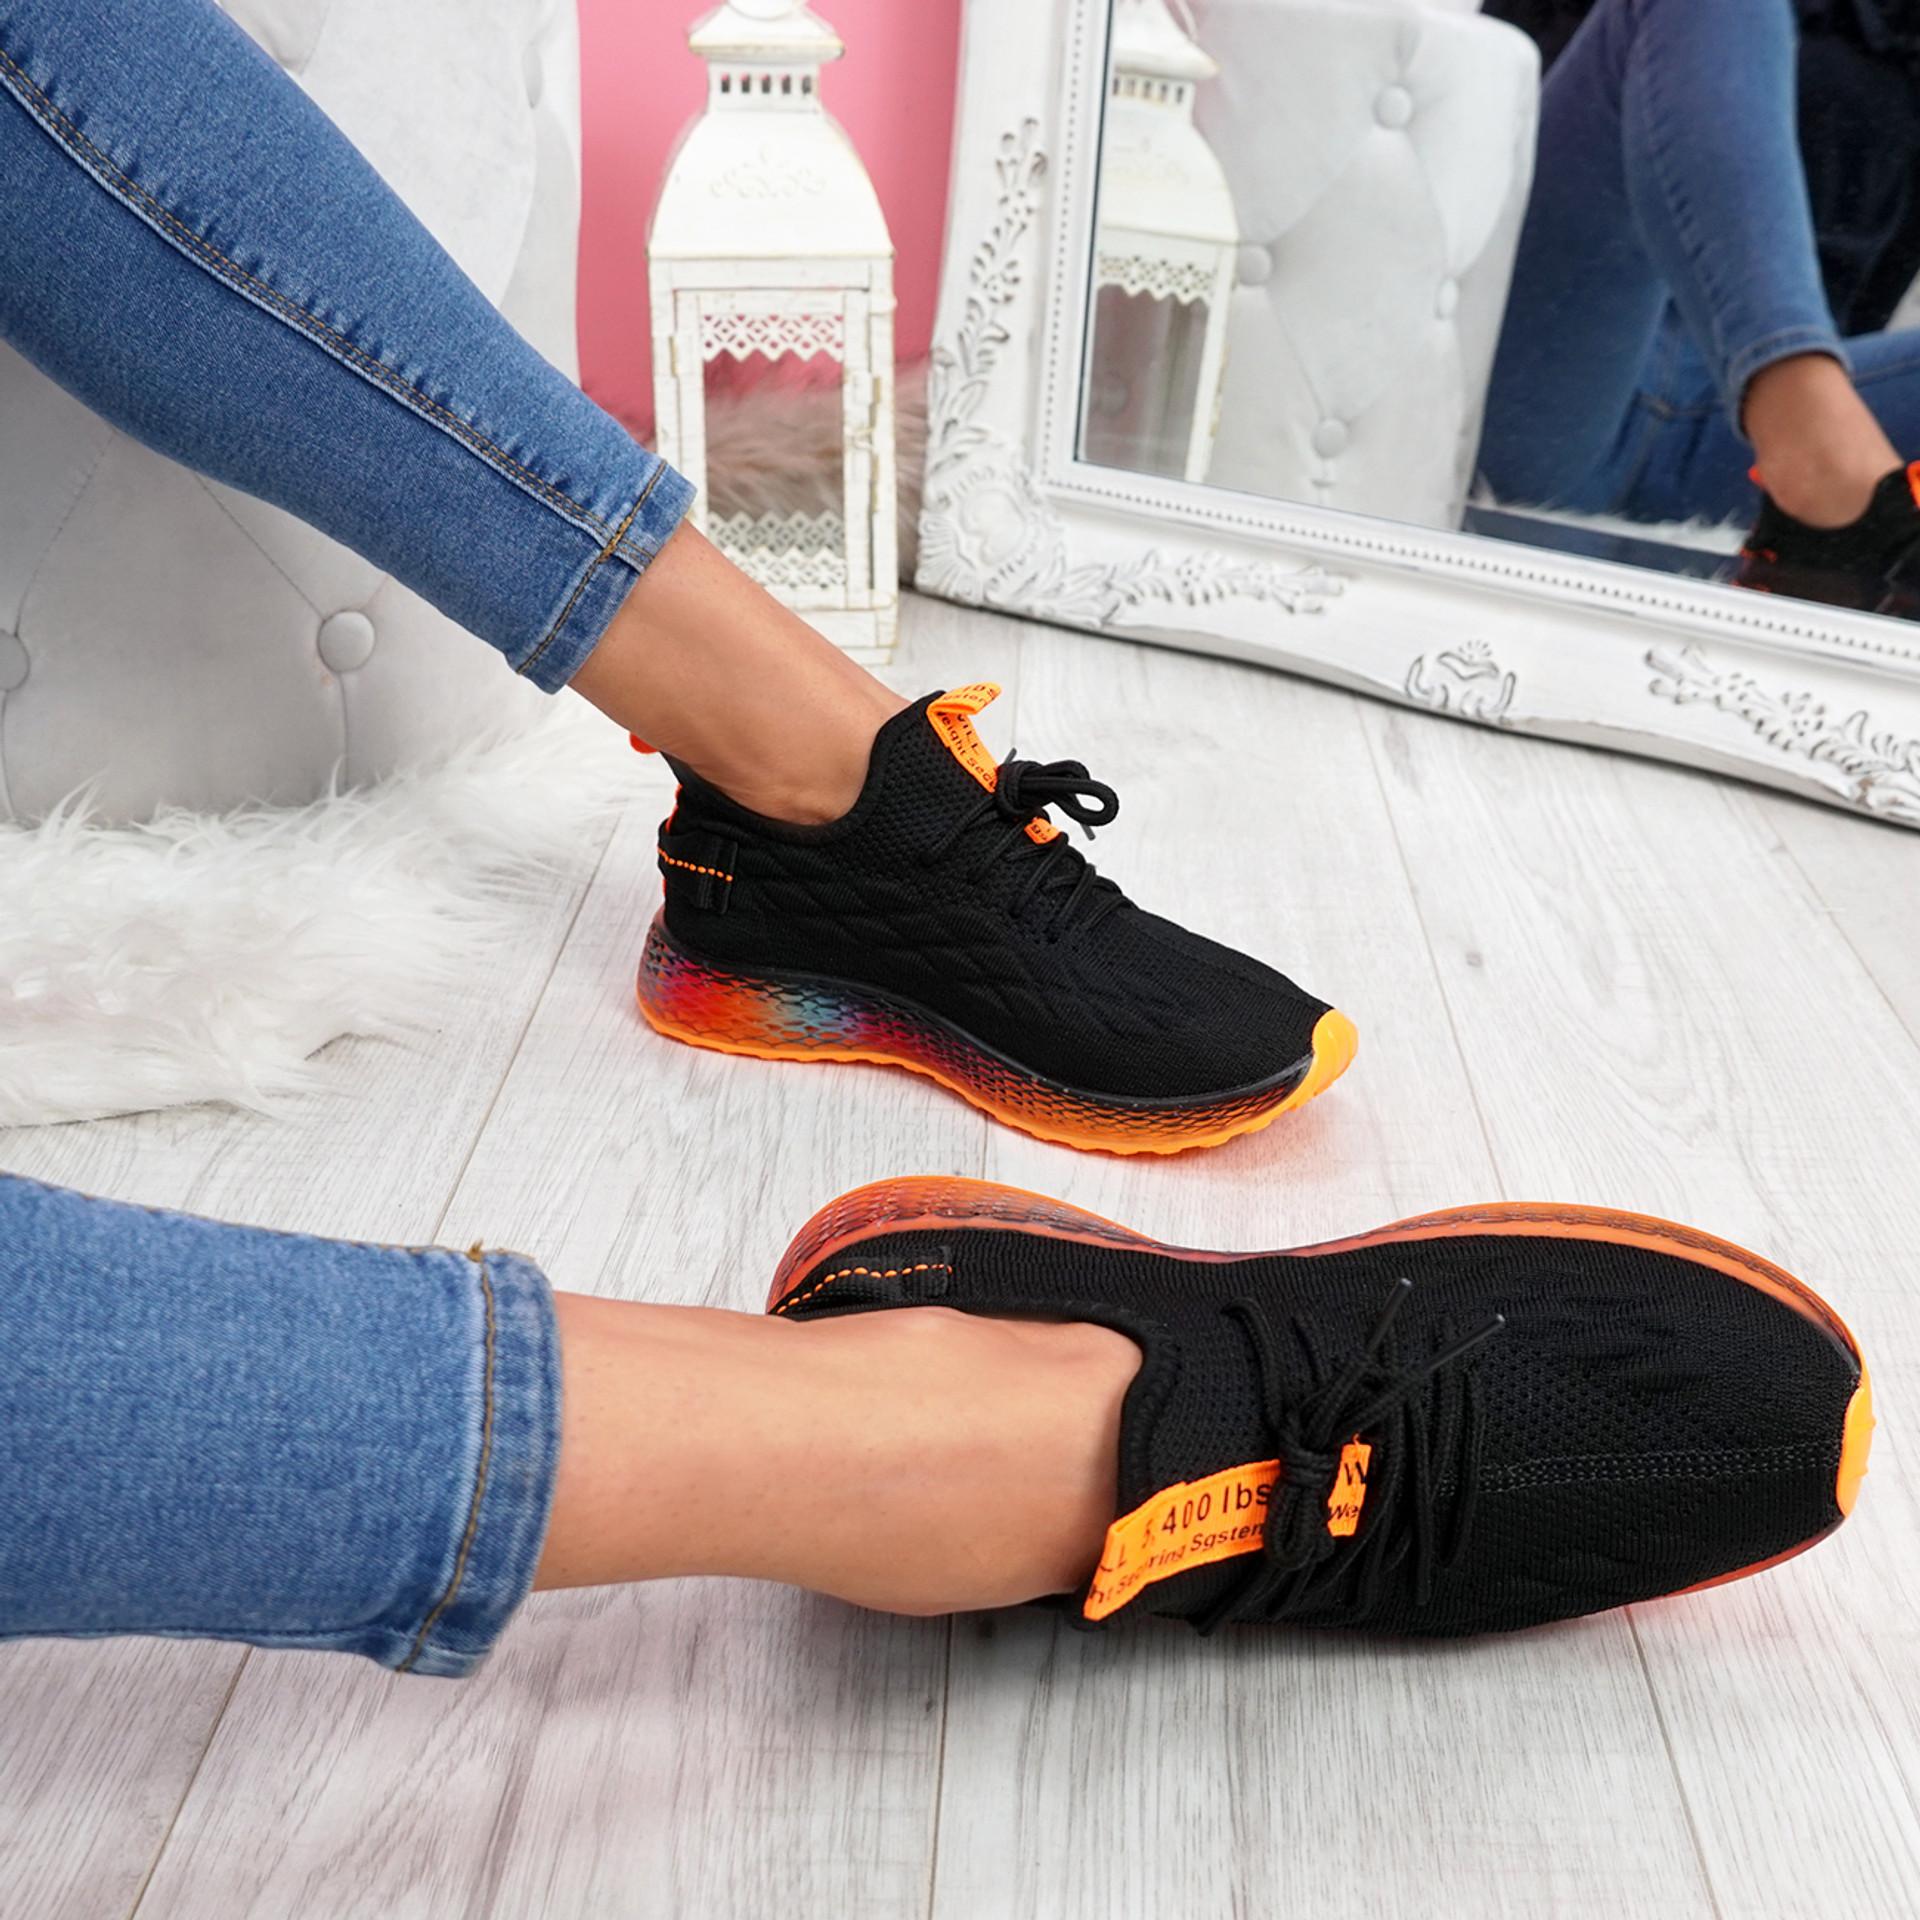 Jima Black Lace Up Sport Sneakers